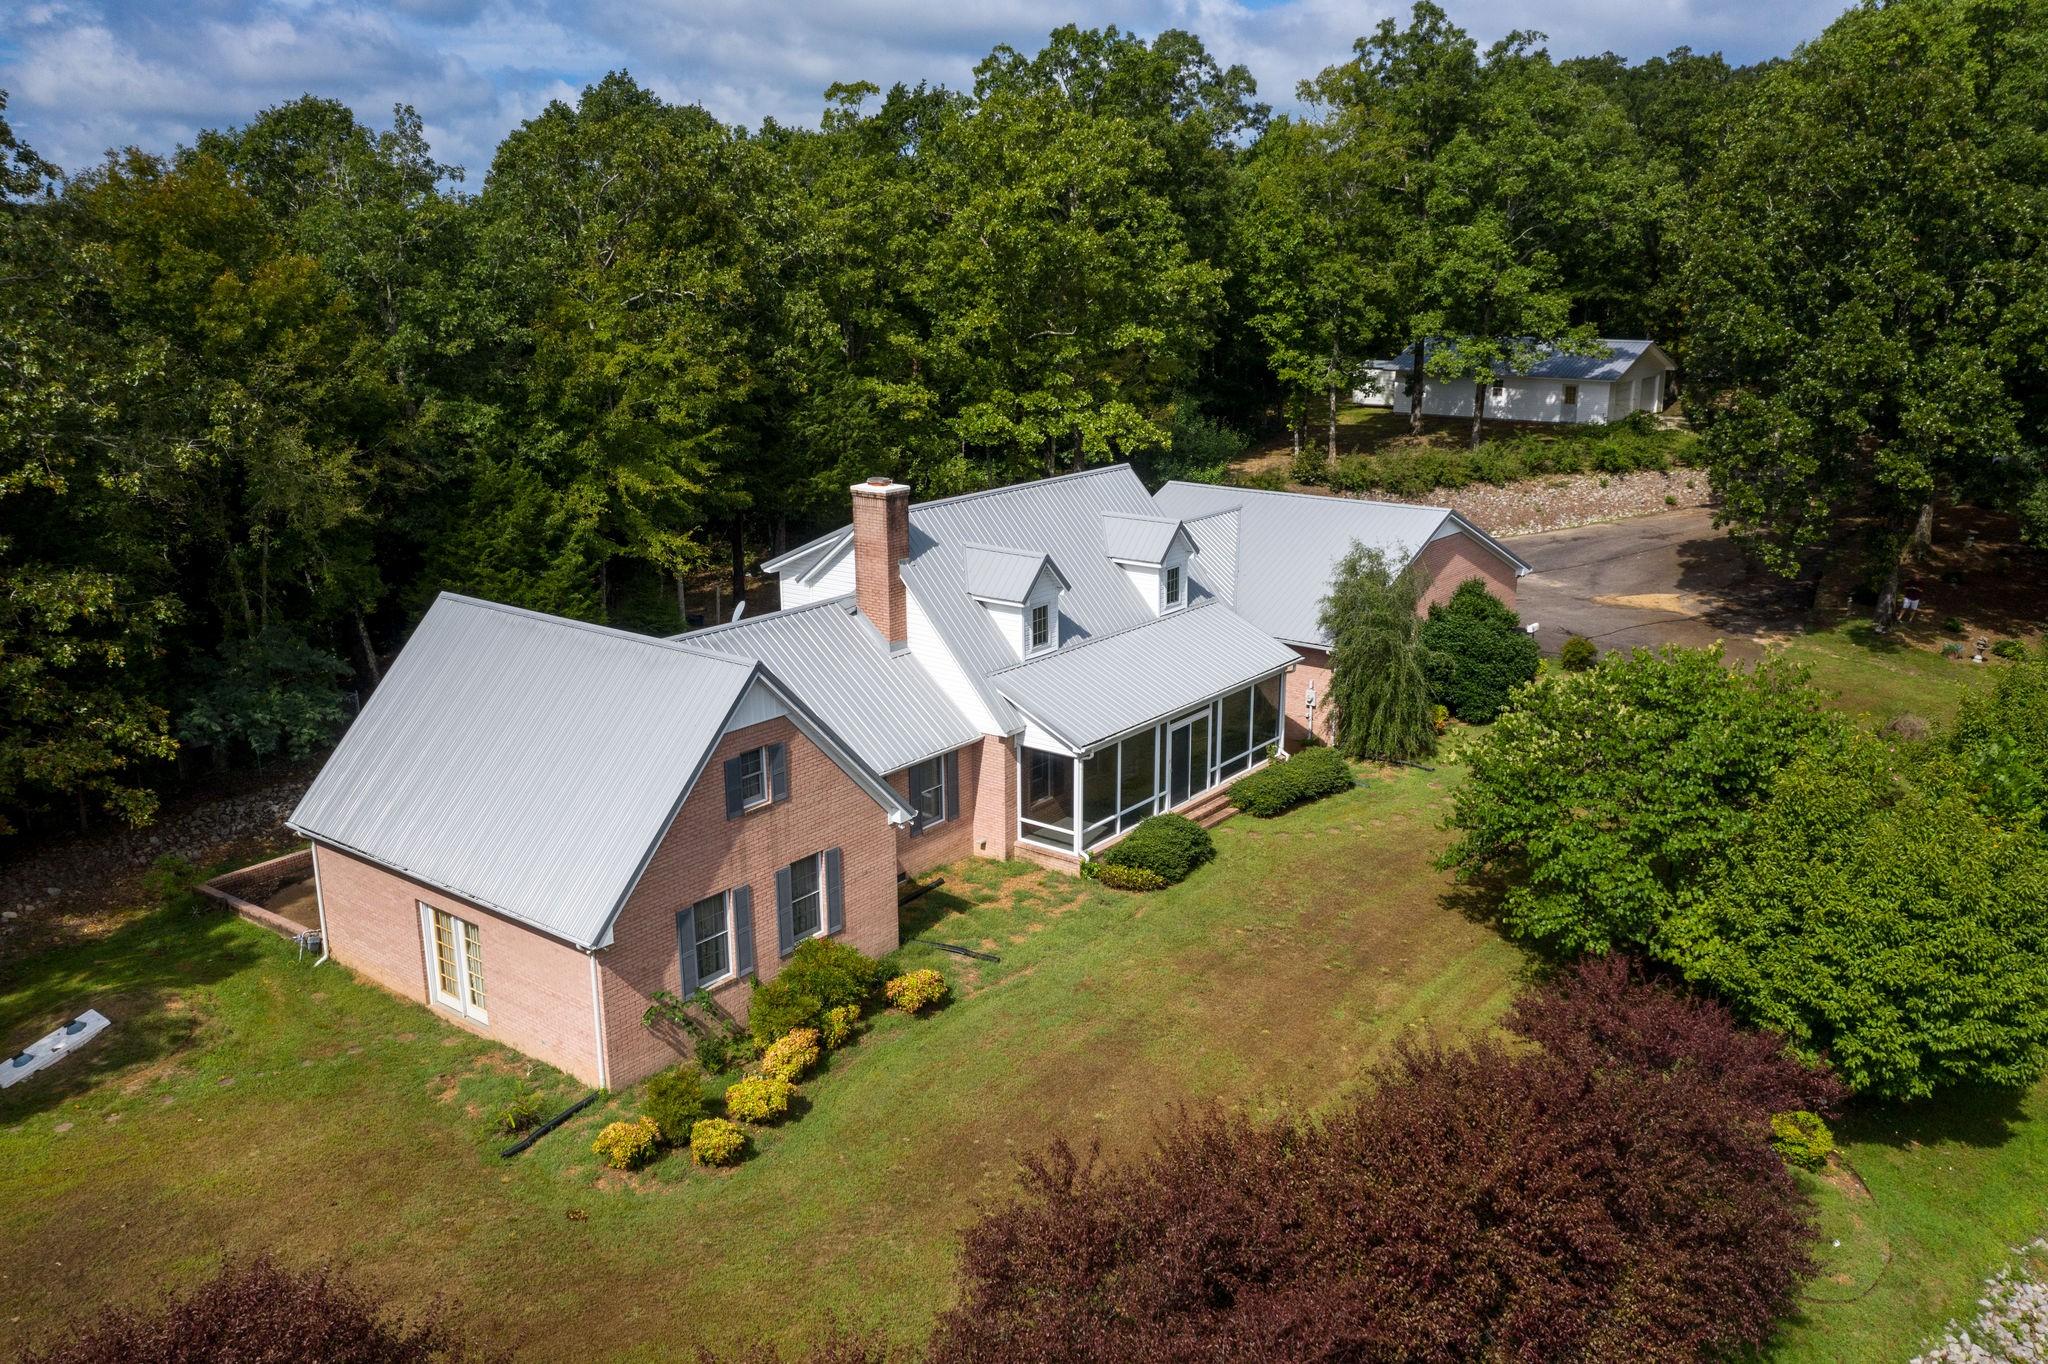 380 W Main St, Linden, TN 37096 - Linden, TN real estate listing